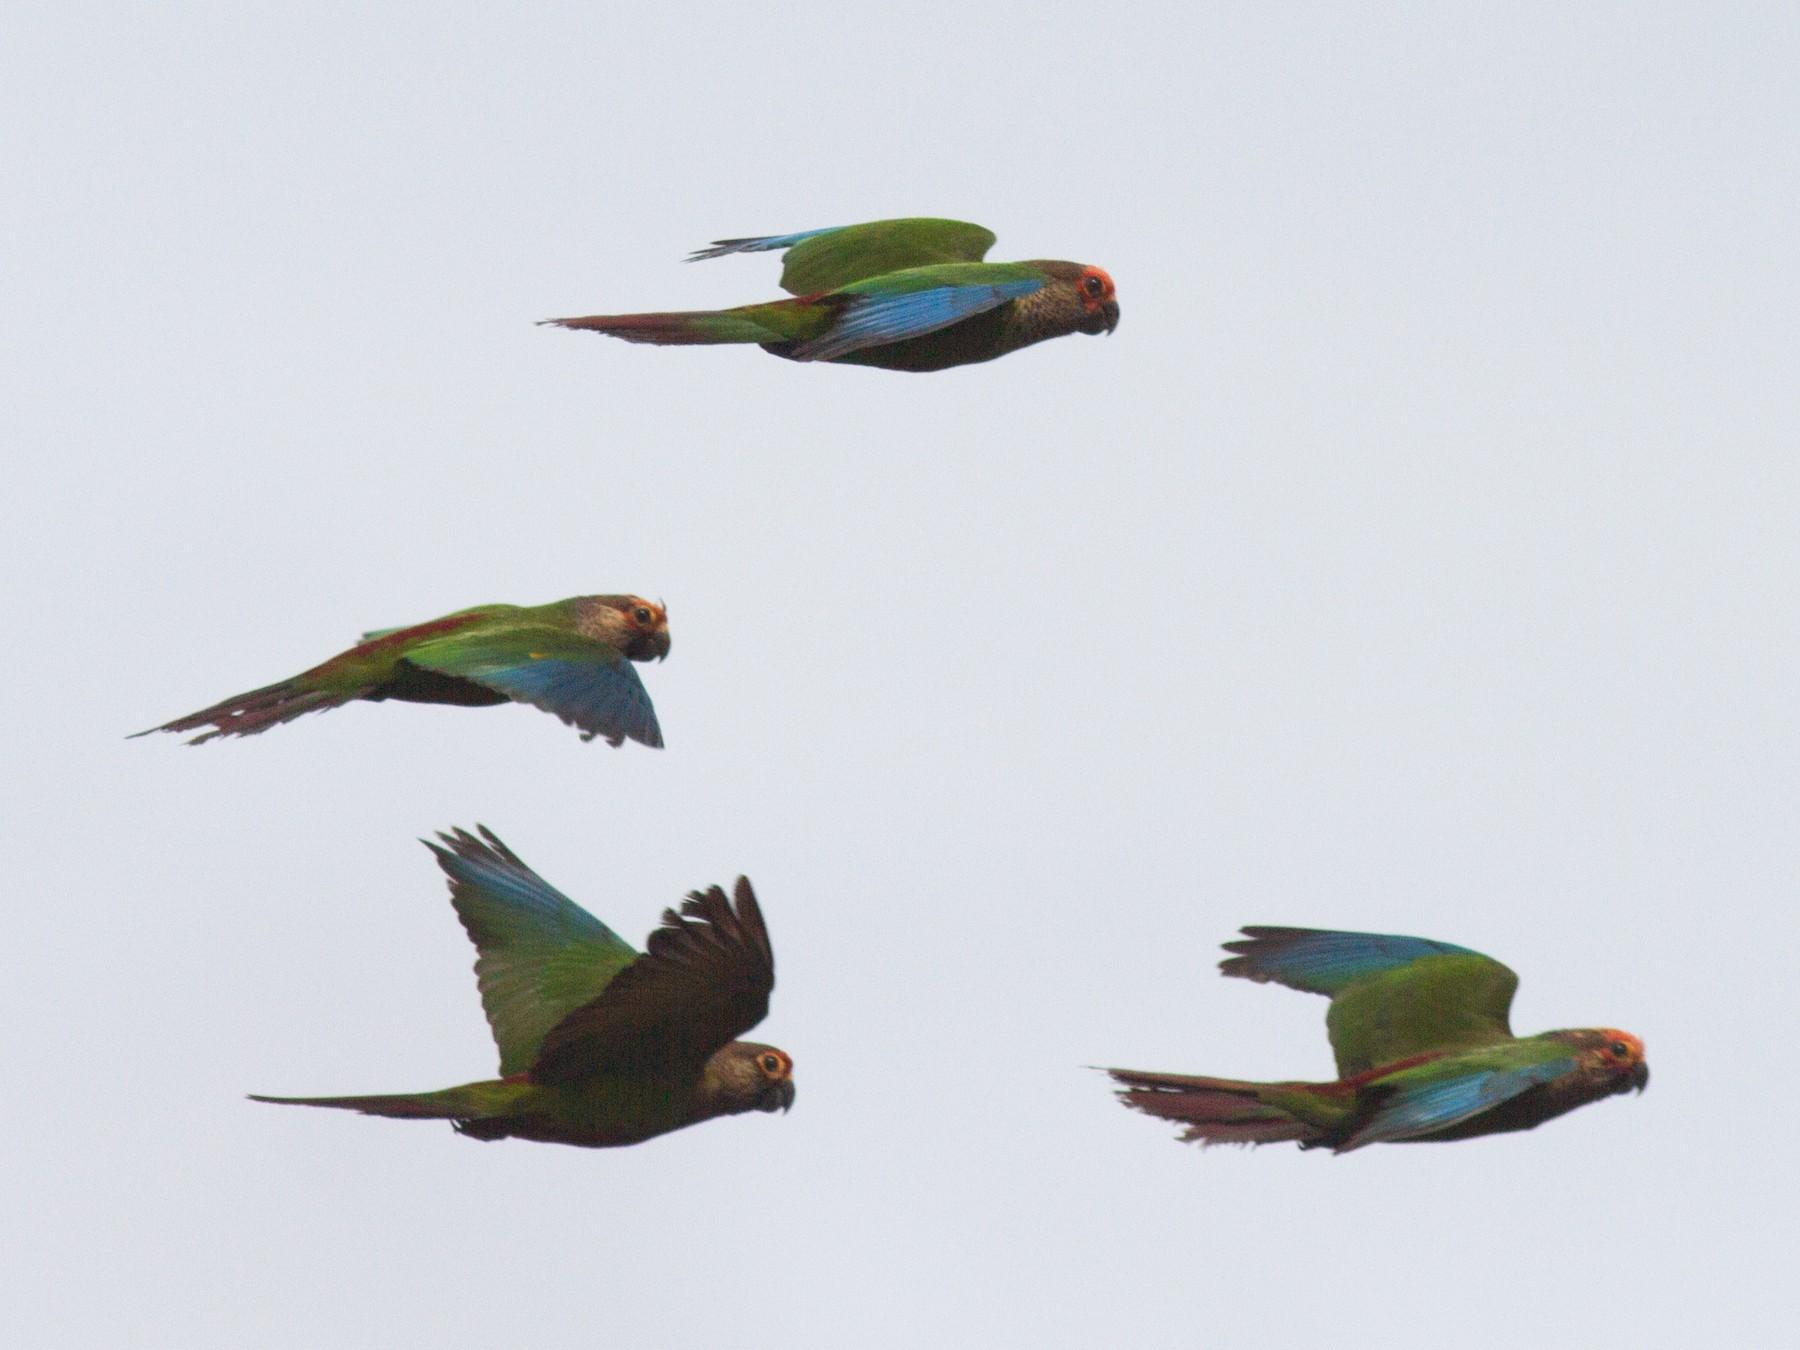 Rose-fronted Parakeet - Justyn Stahl